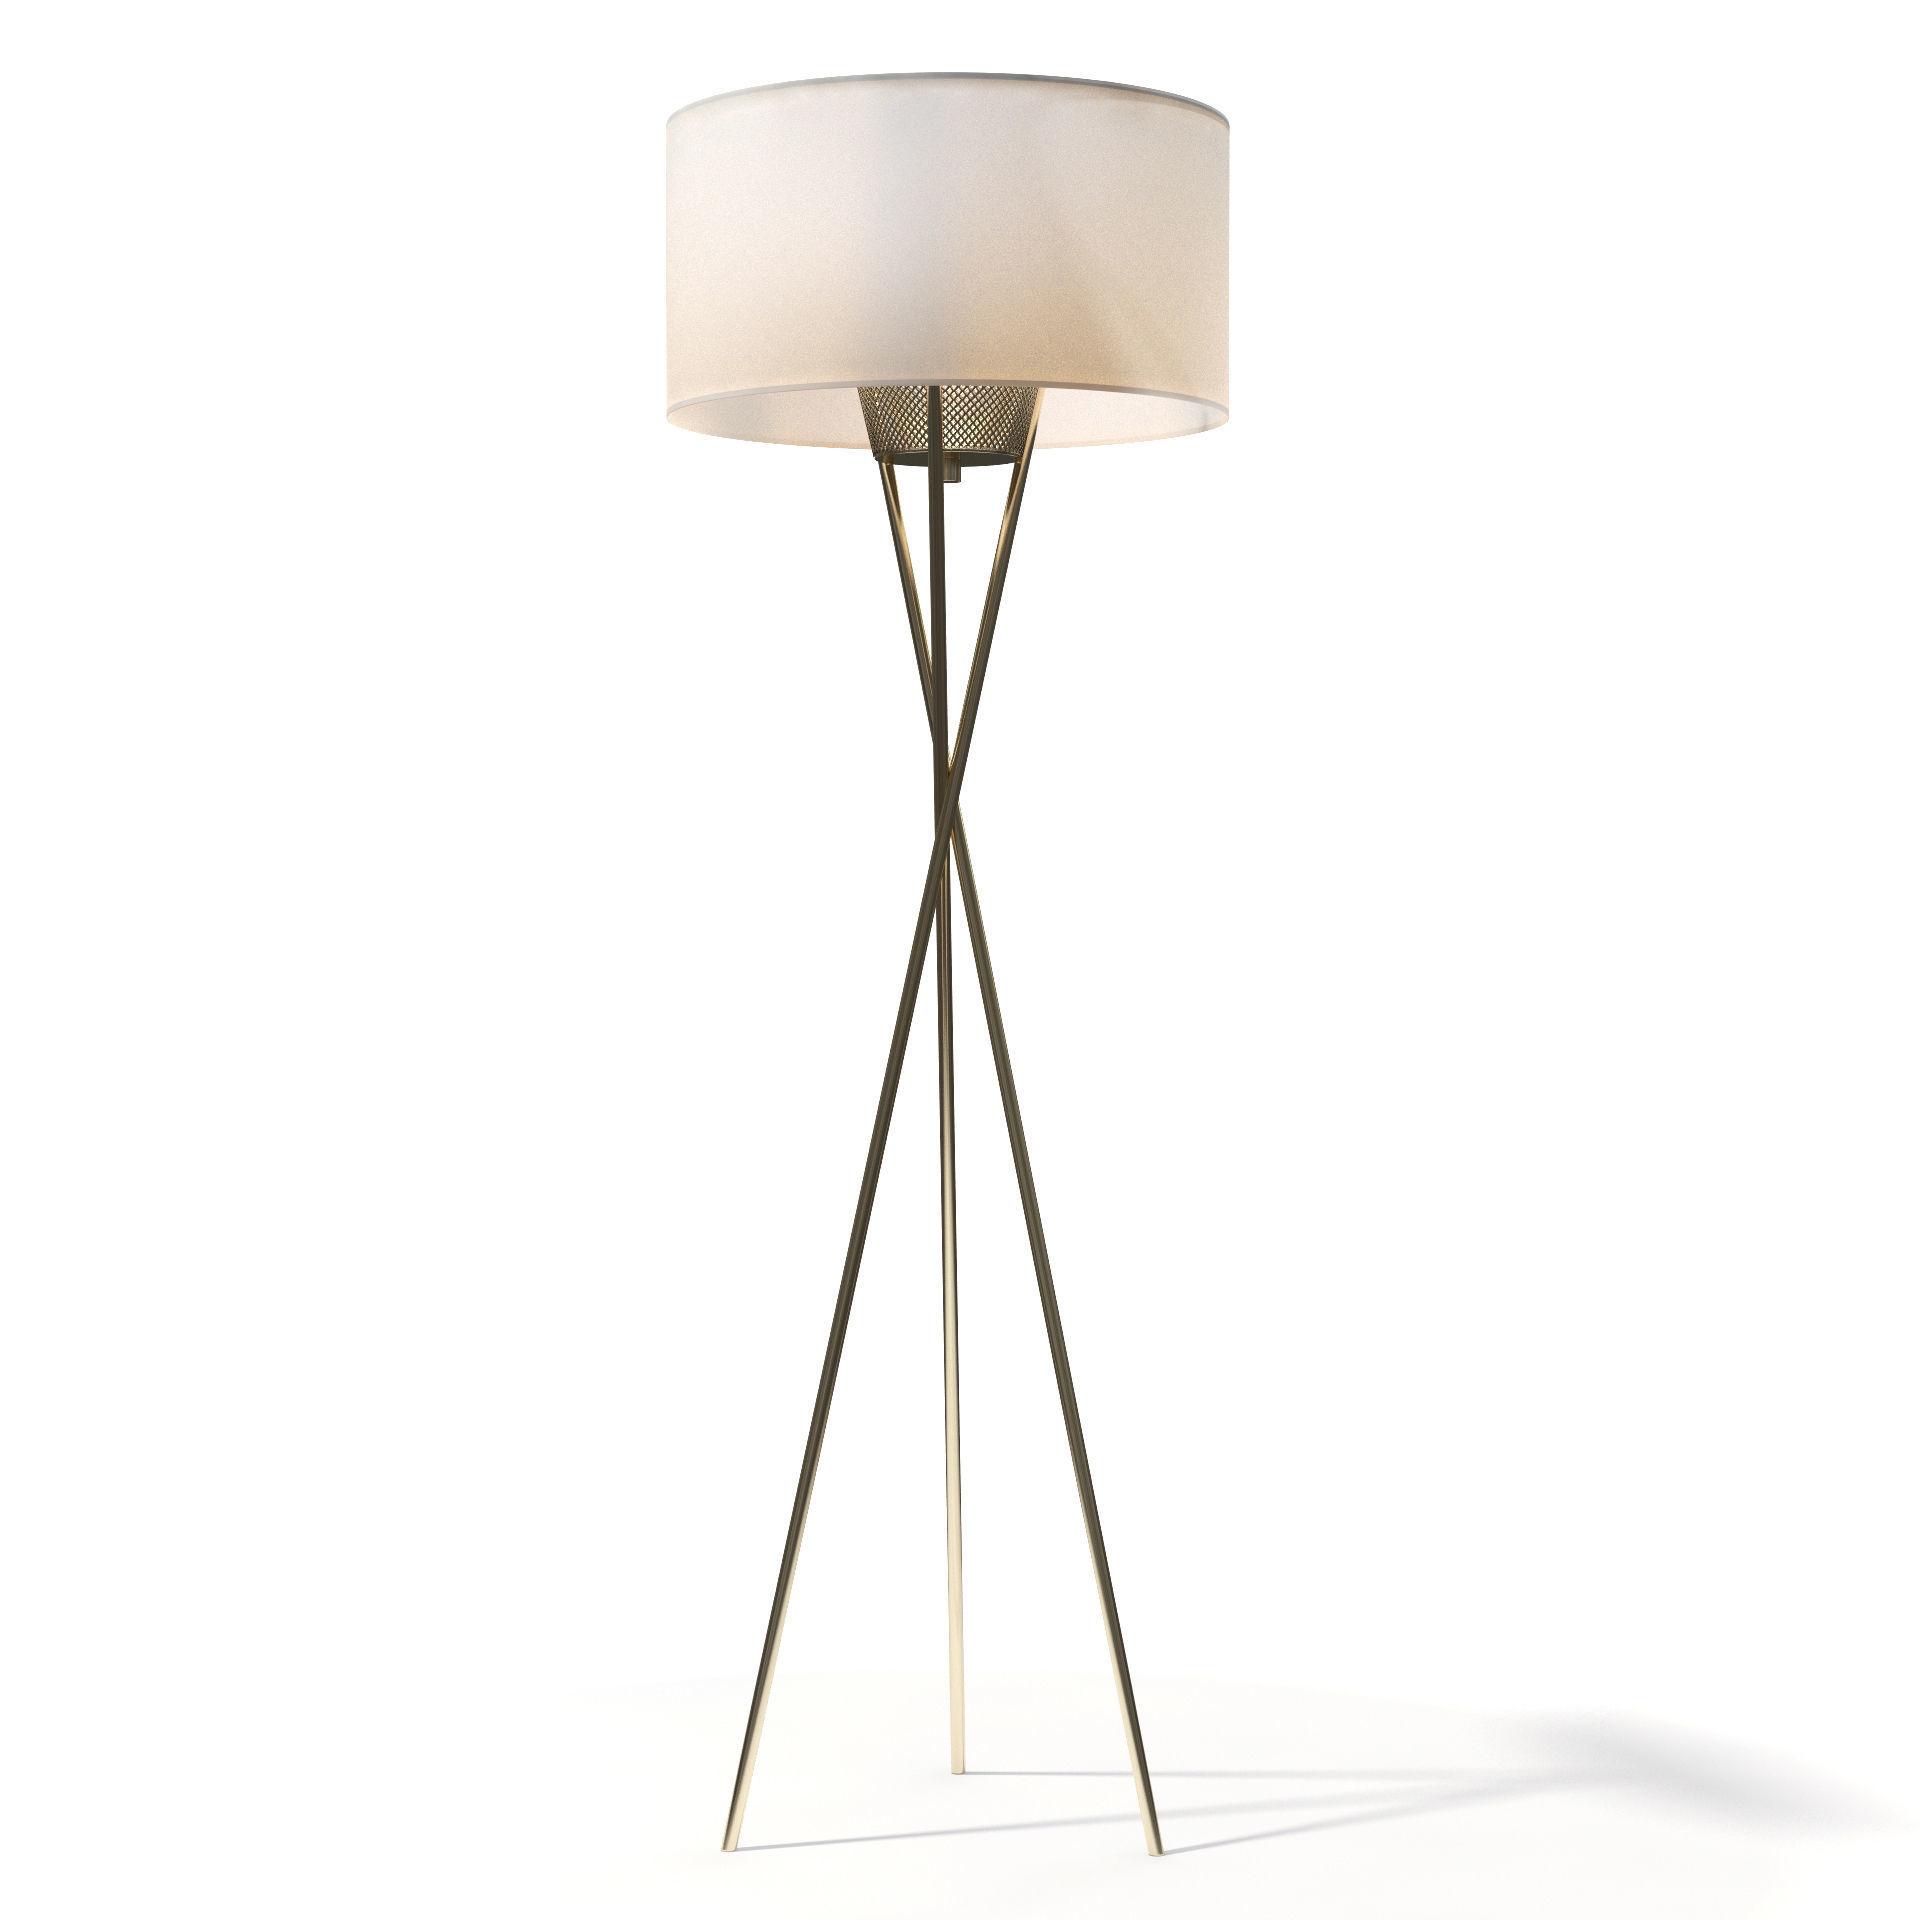 3d Model West Elm Mid Century Tripod Floor Lamp 2